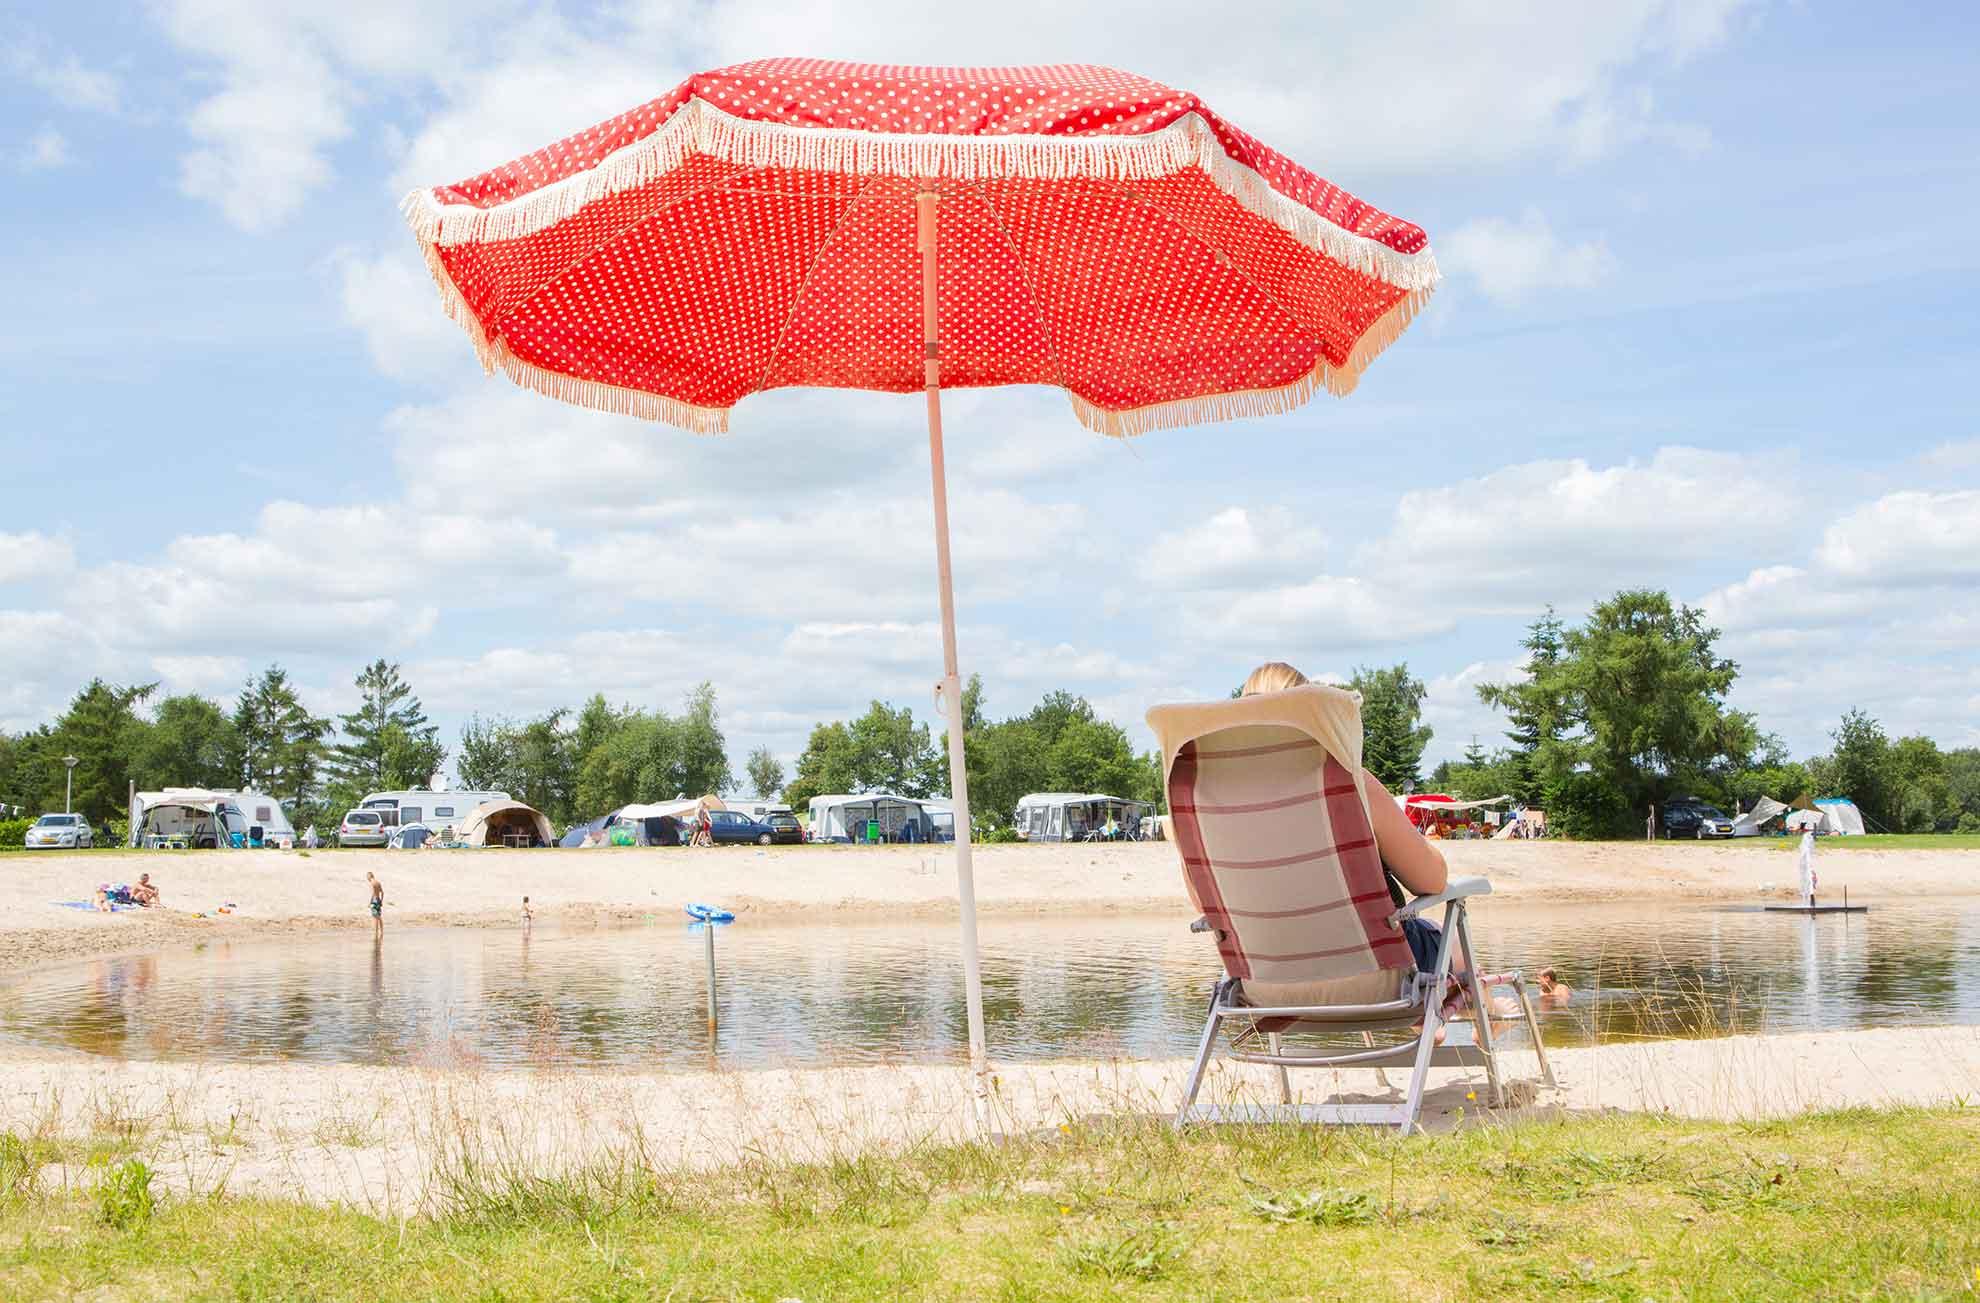 Campingplatz am Wasser bei Het Stoetenslagh - Campingplatz am Wasser